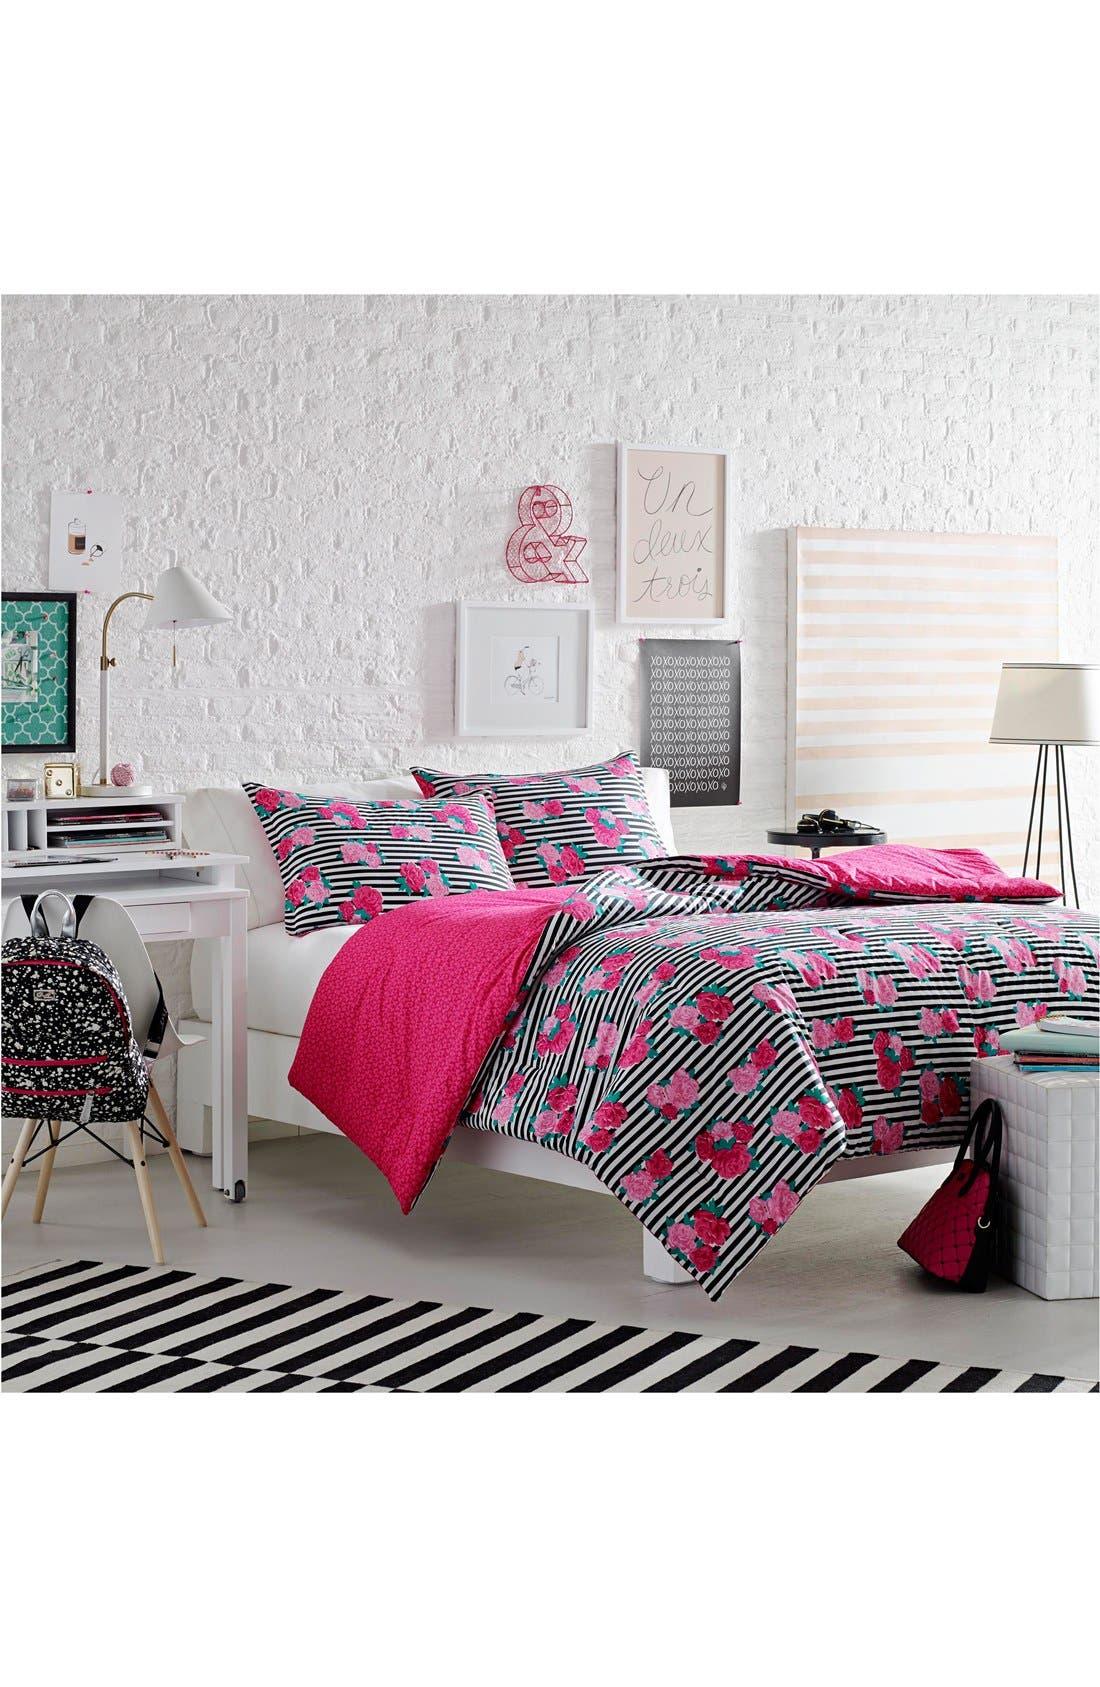 Alternate Image 1 Selected - Betsey Johnson Bedding Royal Roses Comforter & Sham Set